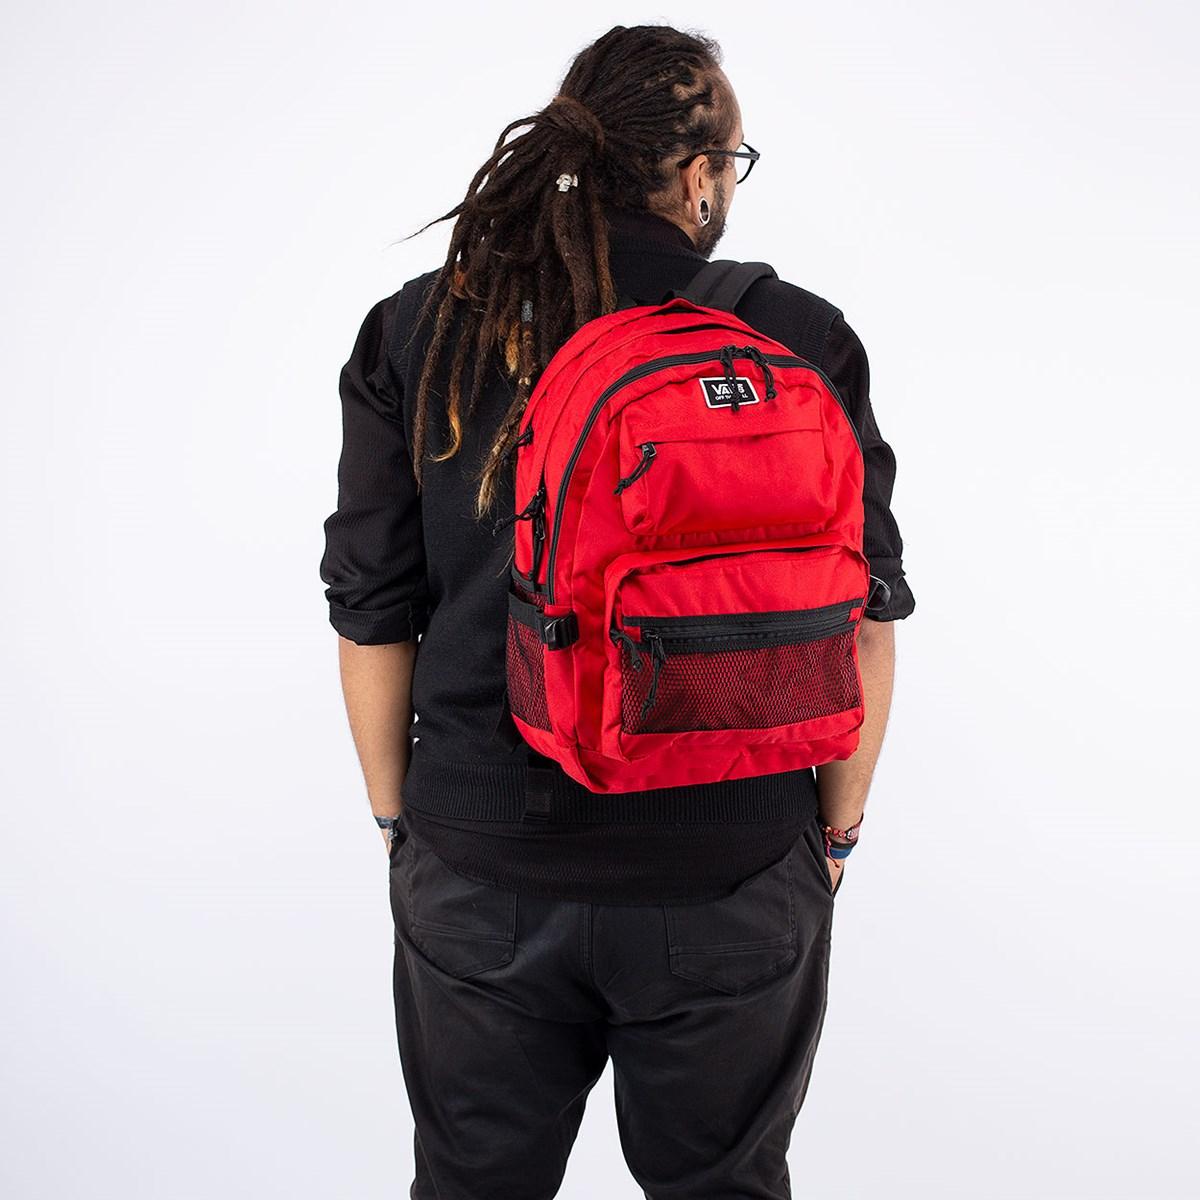 Mochila Vans Stasher Backpack Racing Red VN0A4S6YIZQ